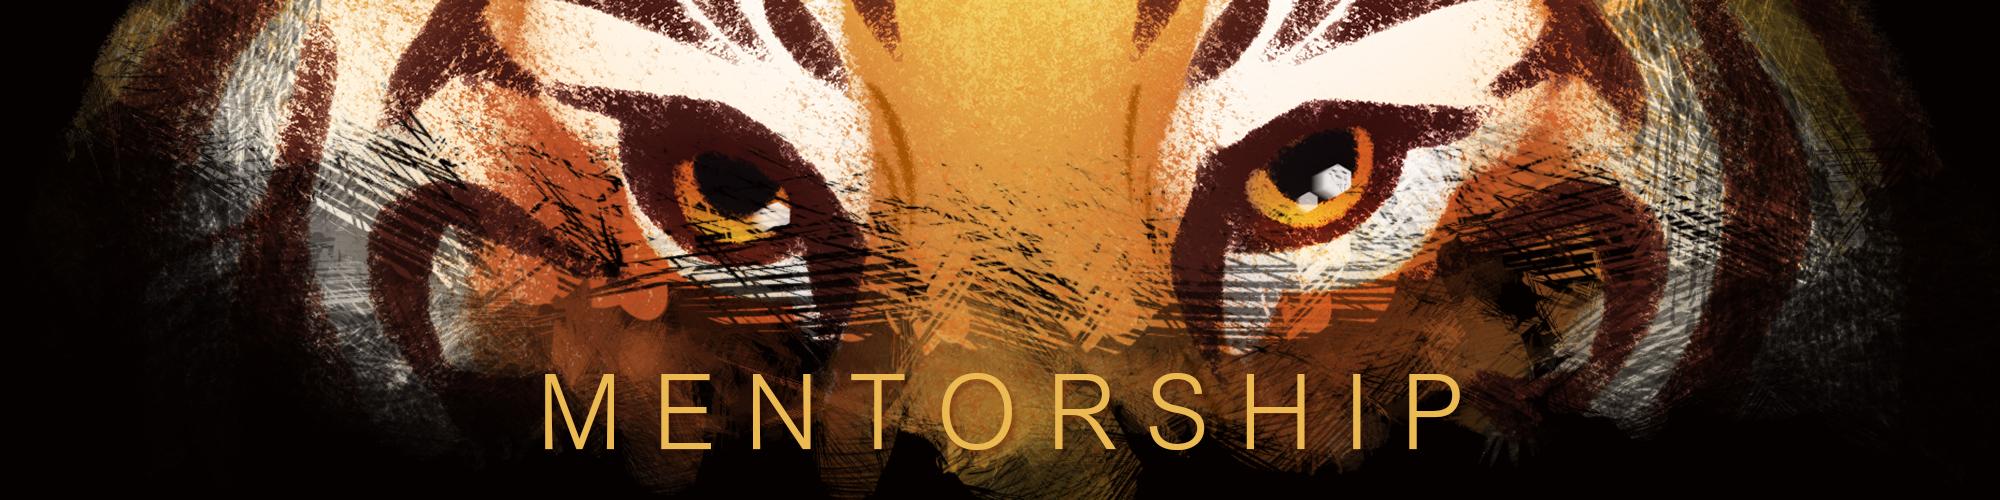 mentorship cover